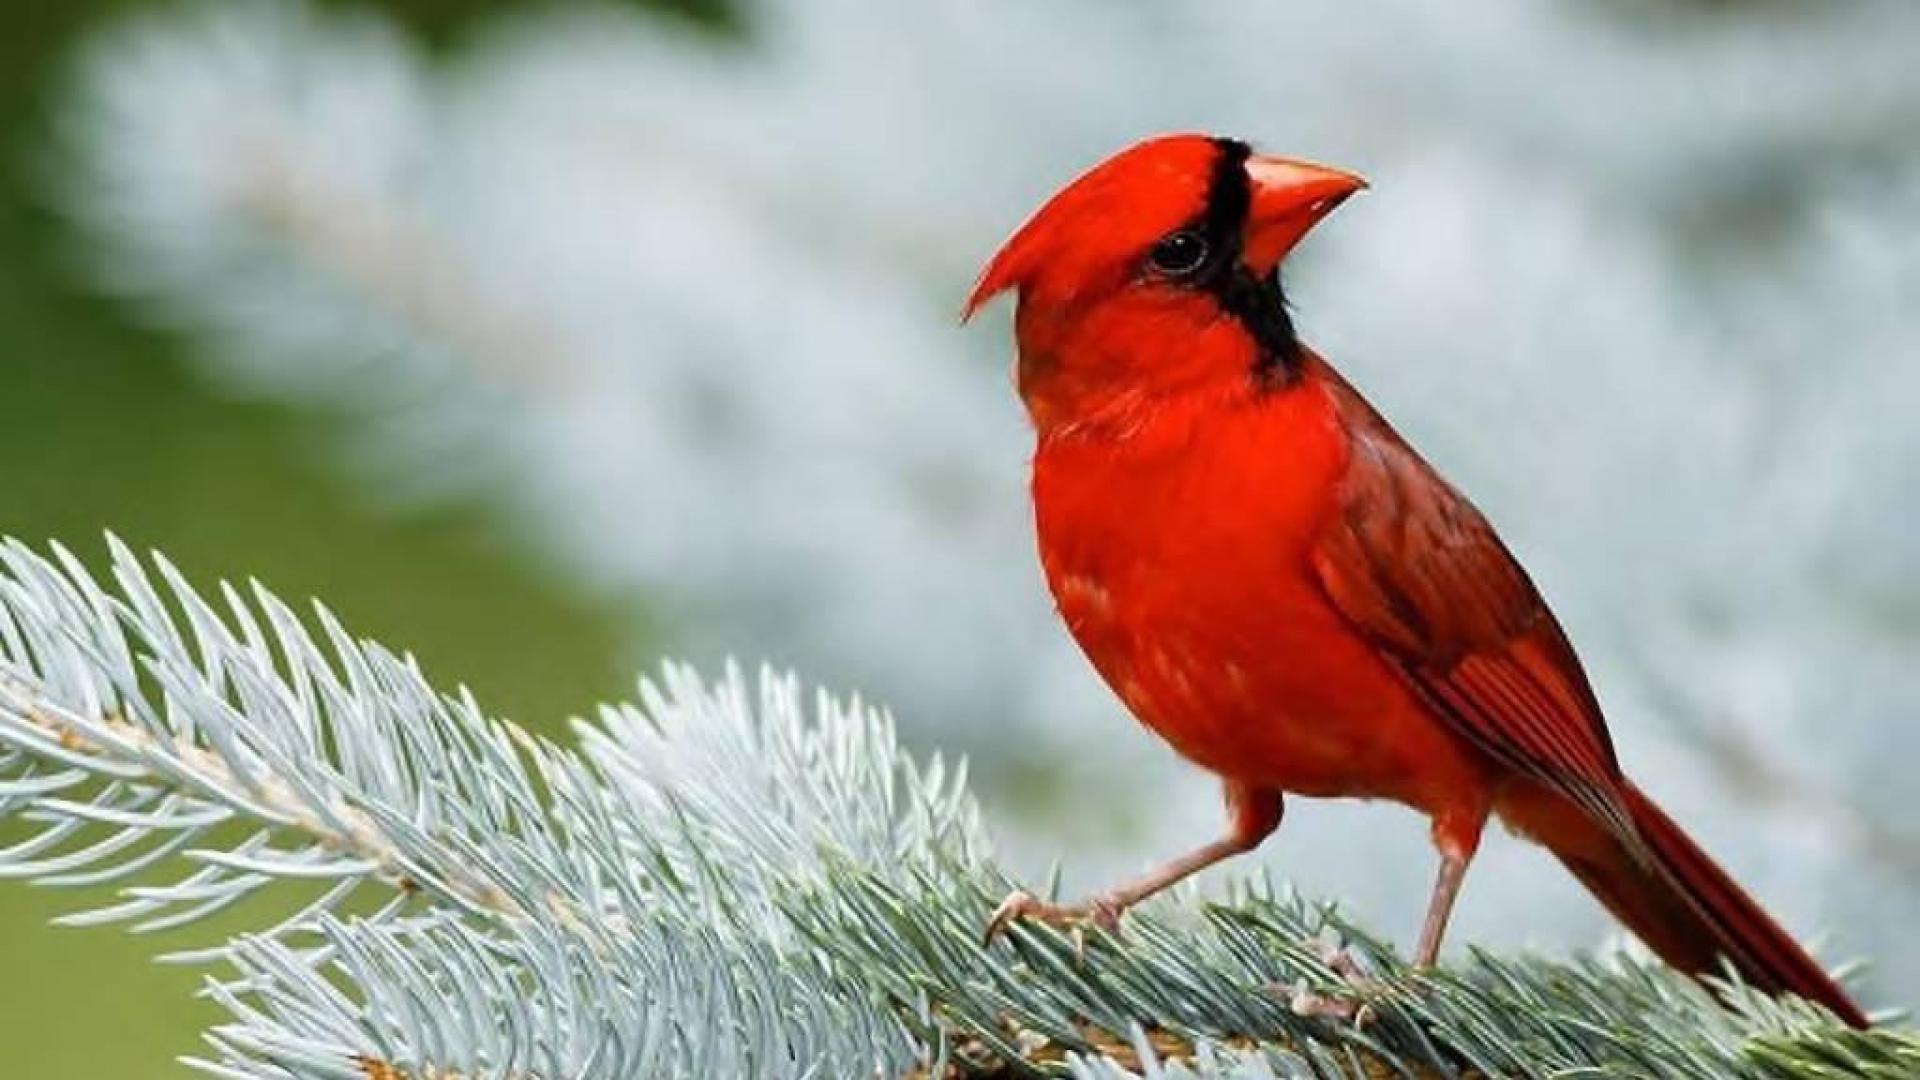 37 winter cardinals desktop wallpaper on wallpapersafari - Winter cardinal wallpaper ...